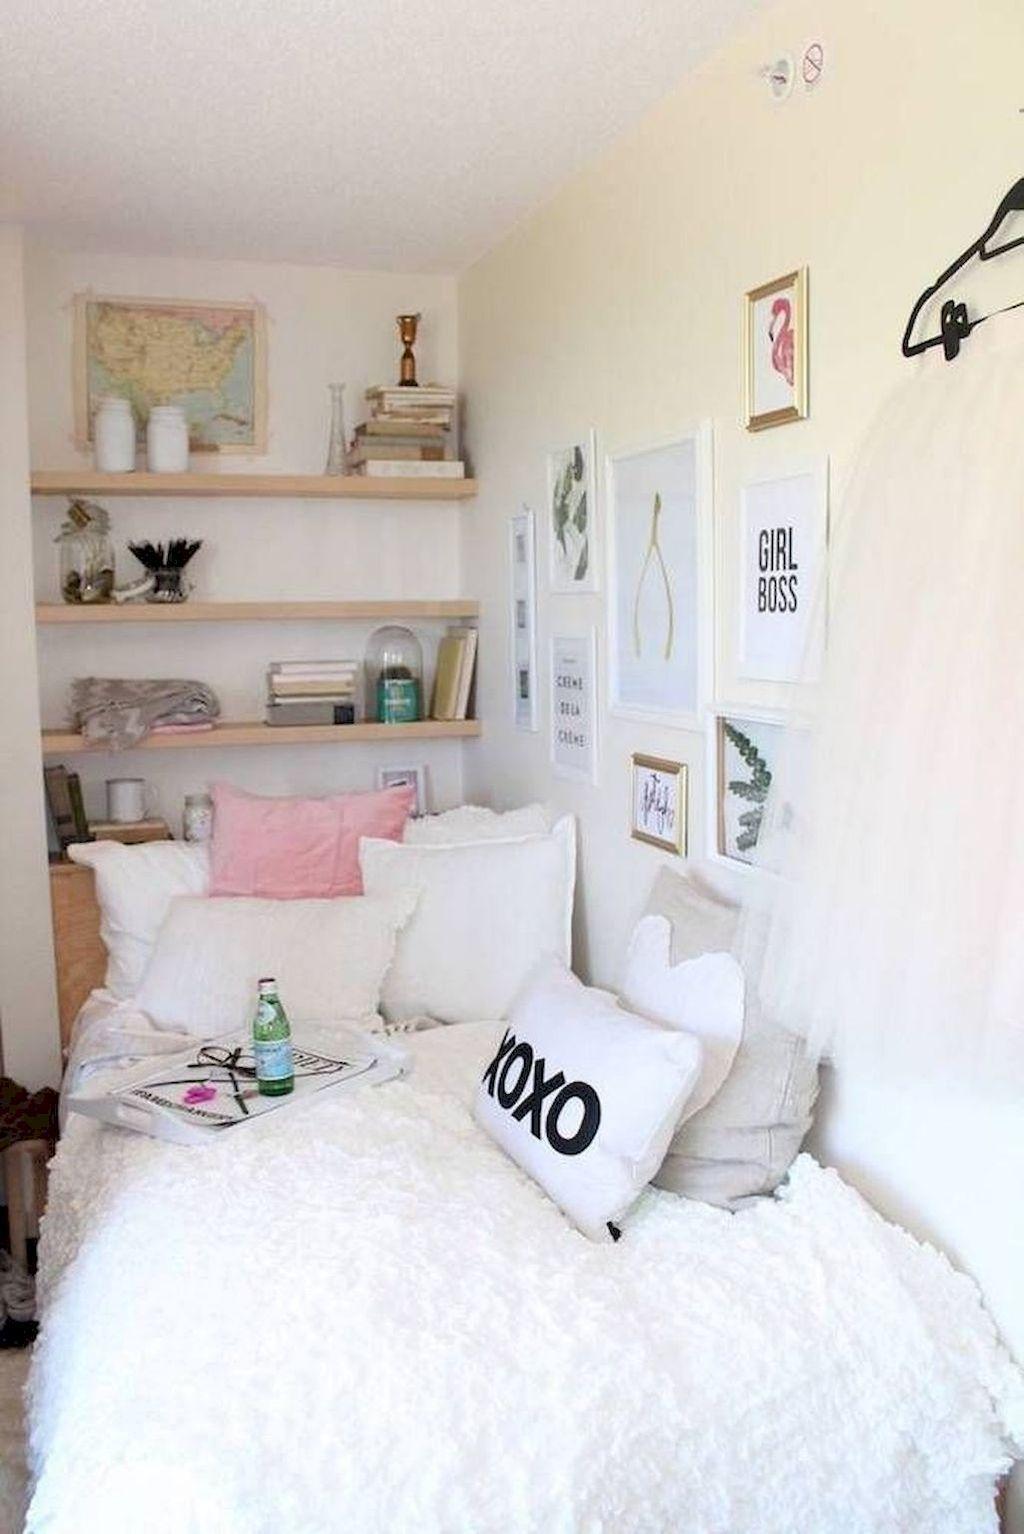 80 Genius Dorm Room Decorating Ideas On A Budget Dorm Room Decor